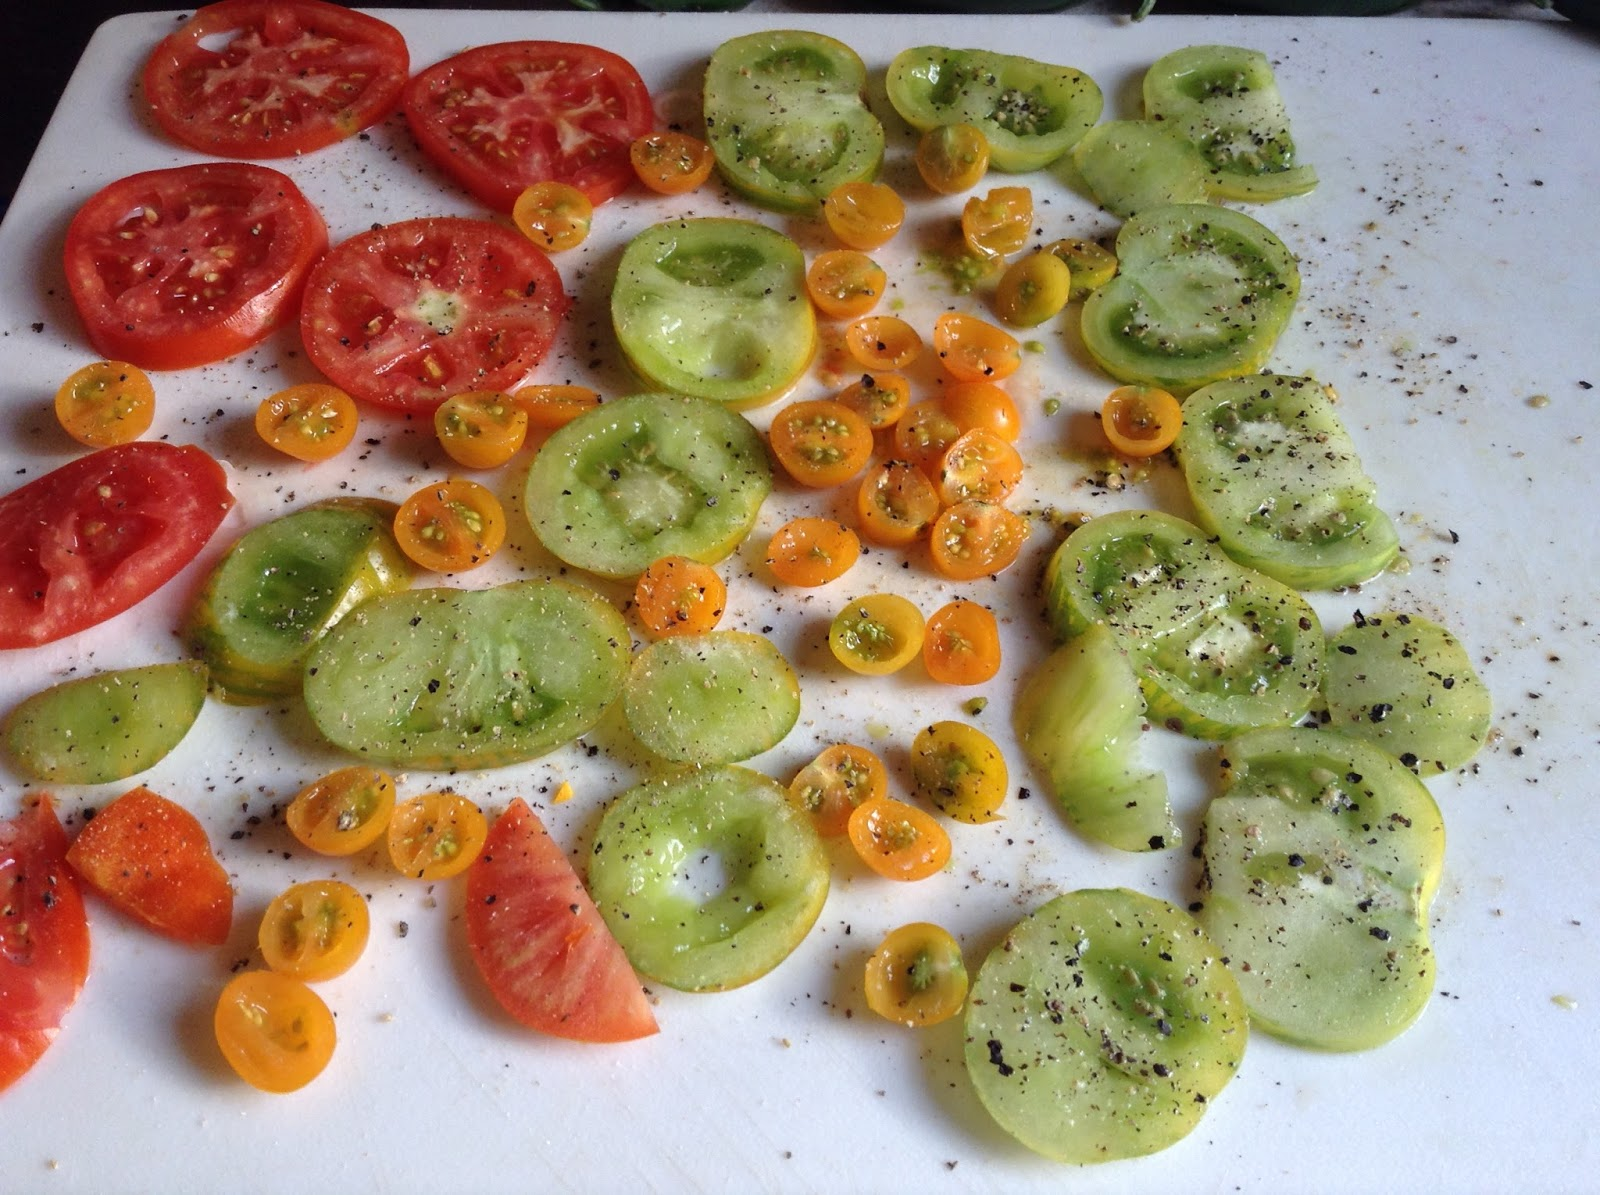 Southern Green Living: Summer Vegetable Gratin